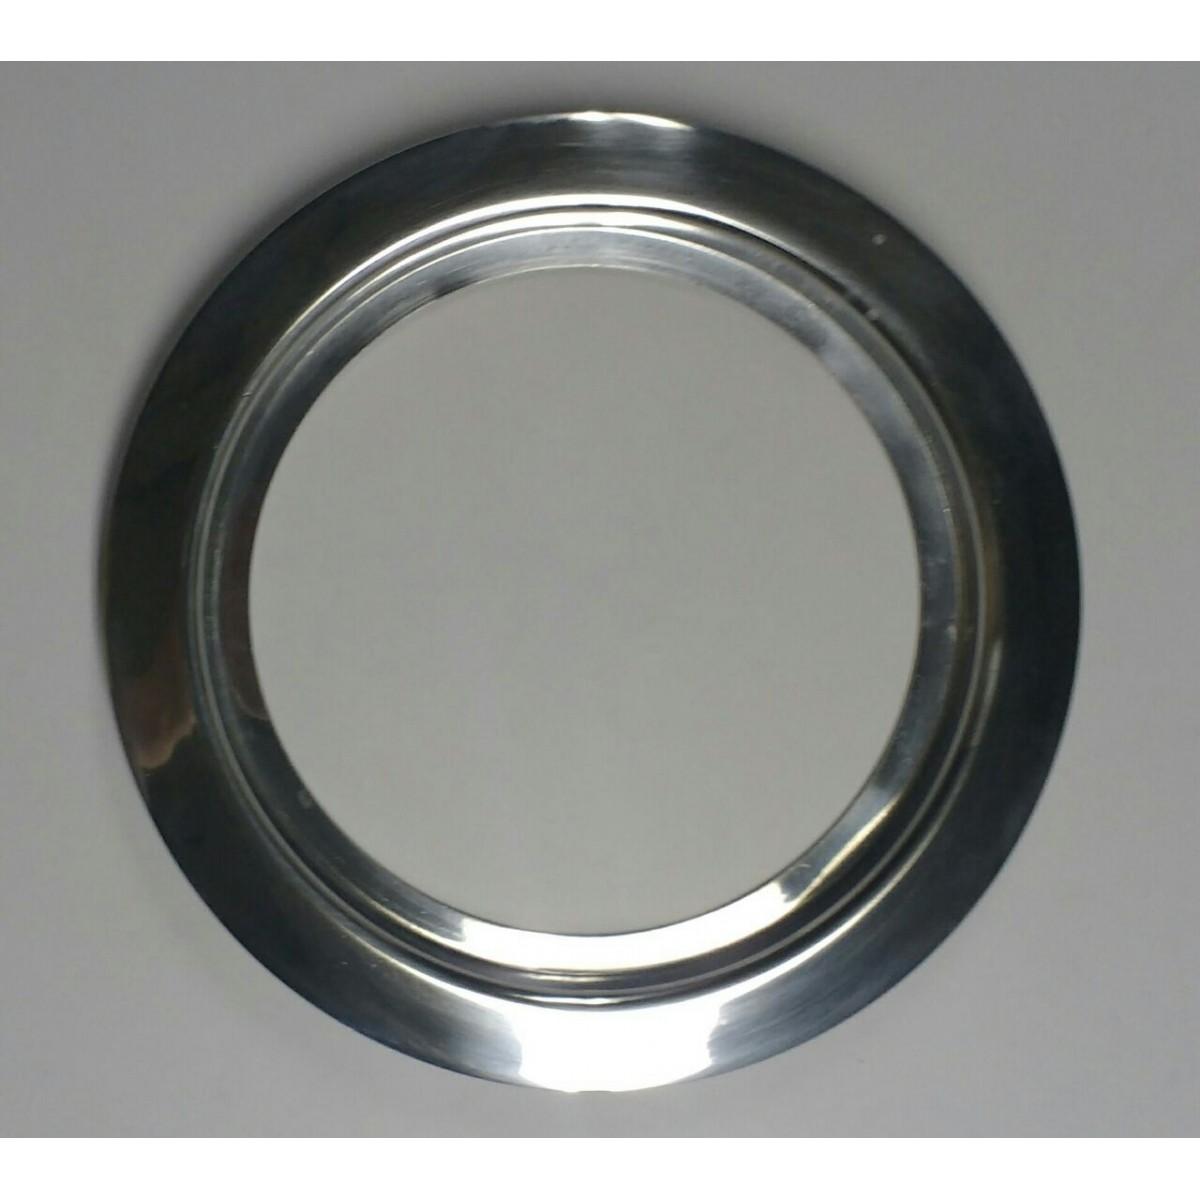 Ma-02/kit 18,5/22 cm escotilha polida+vidro+silicone